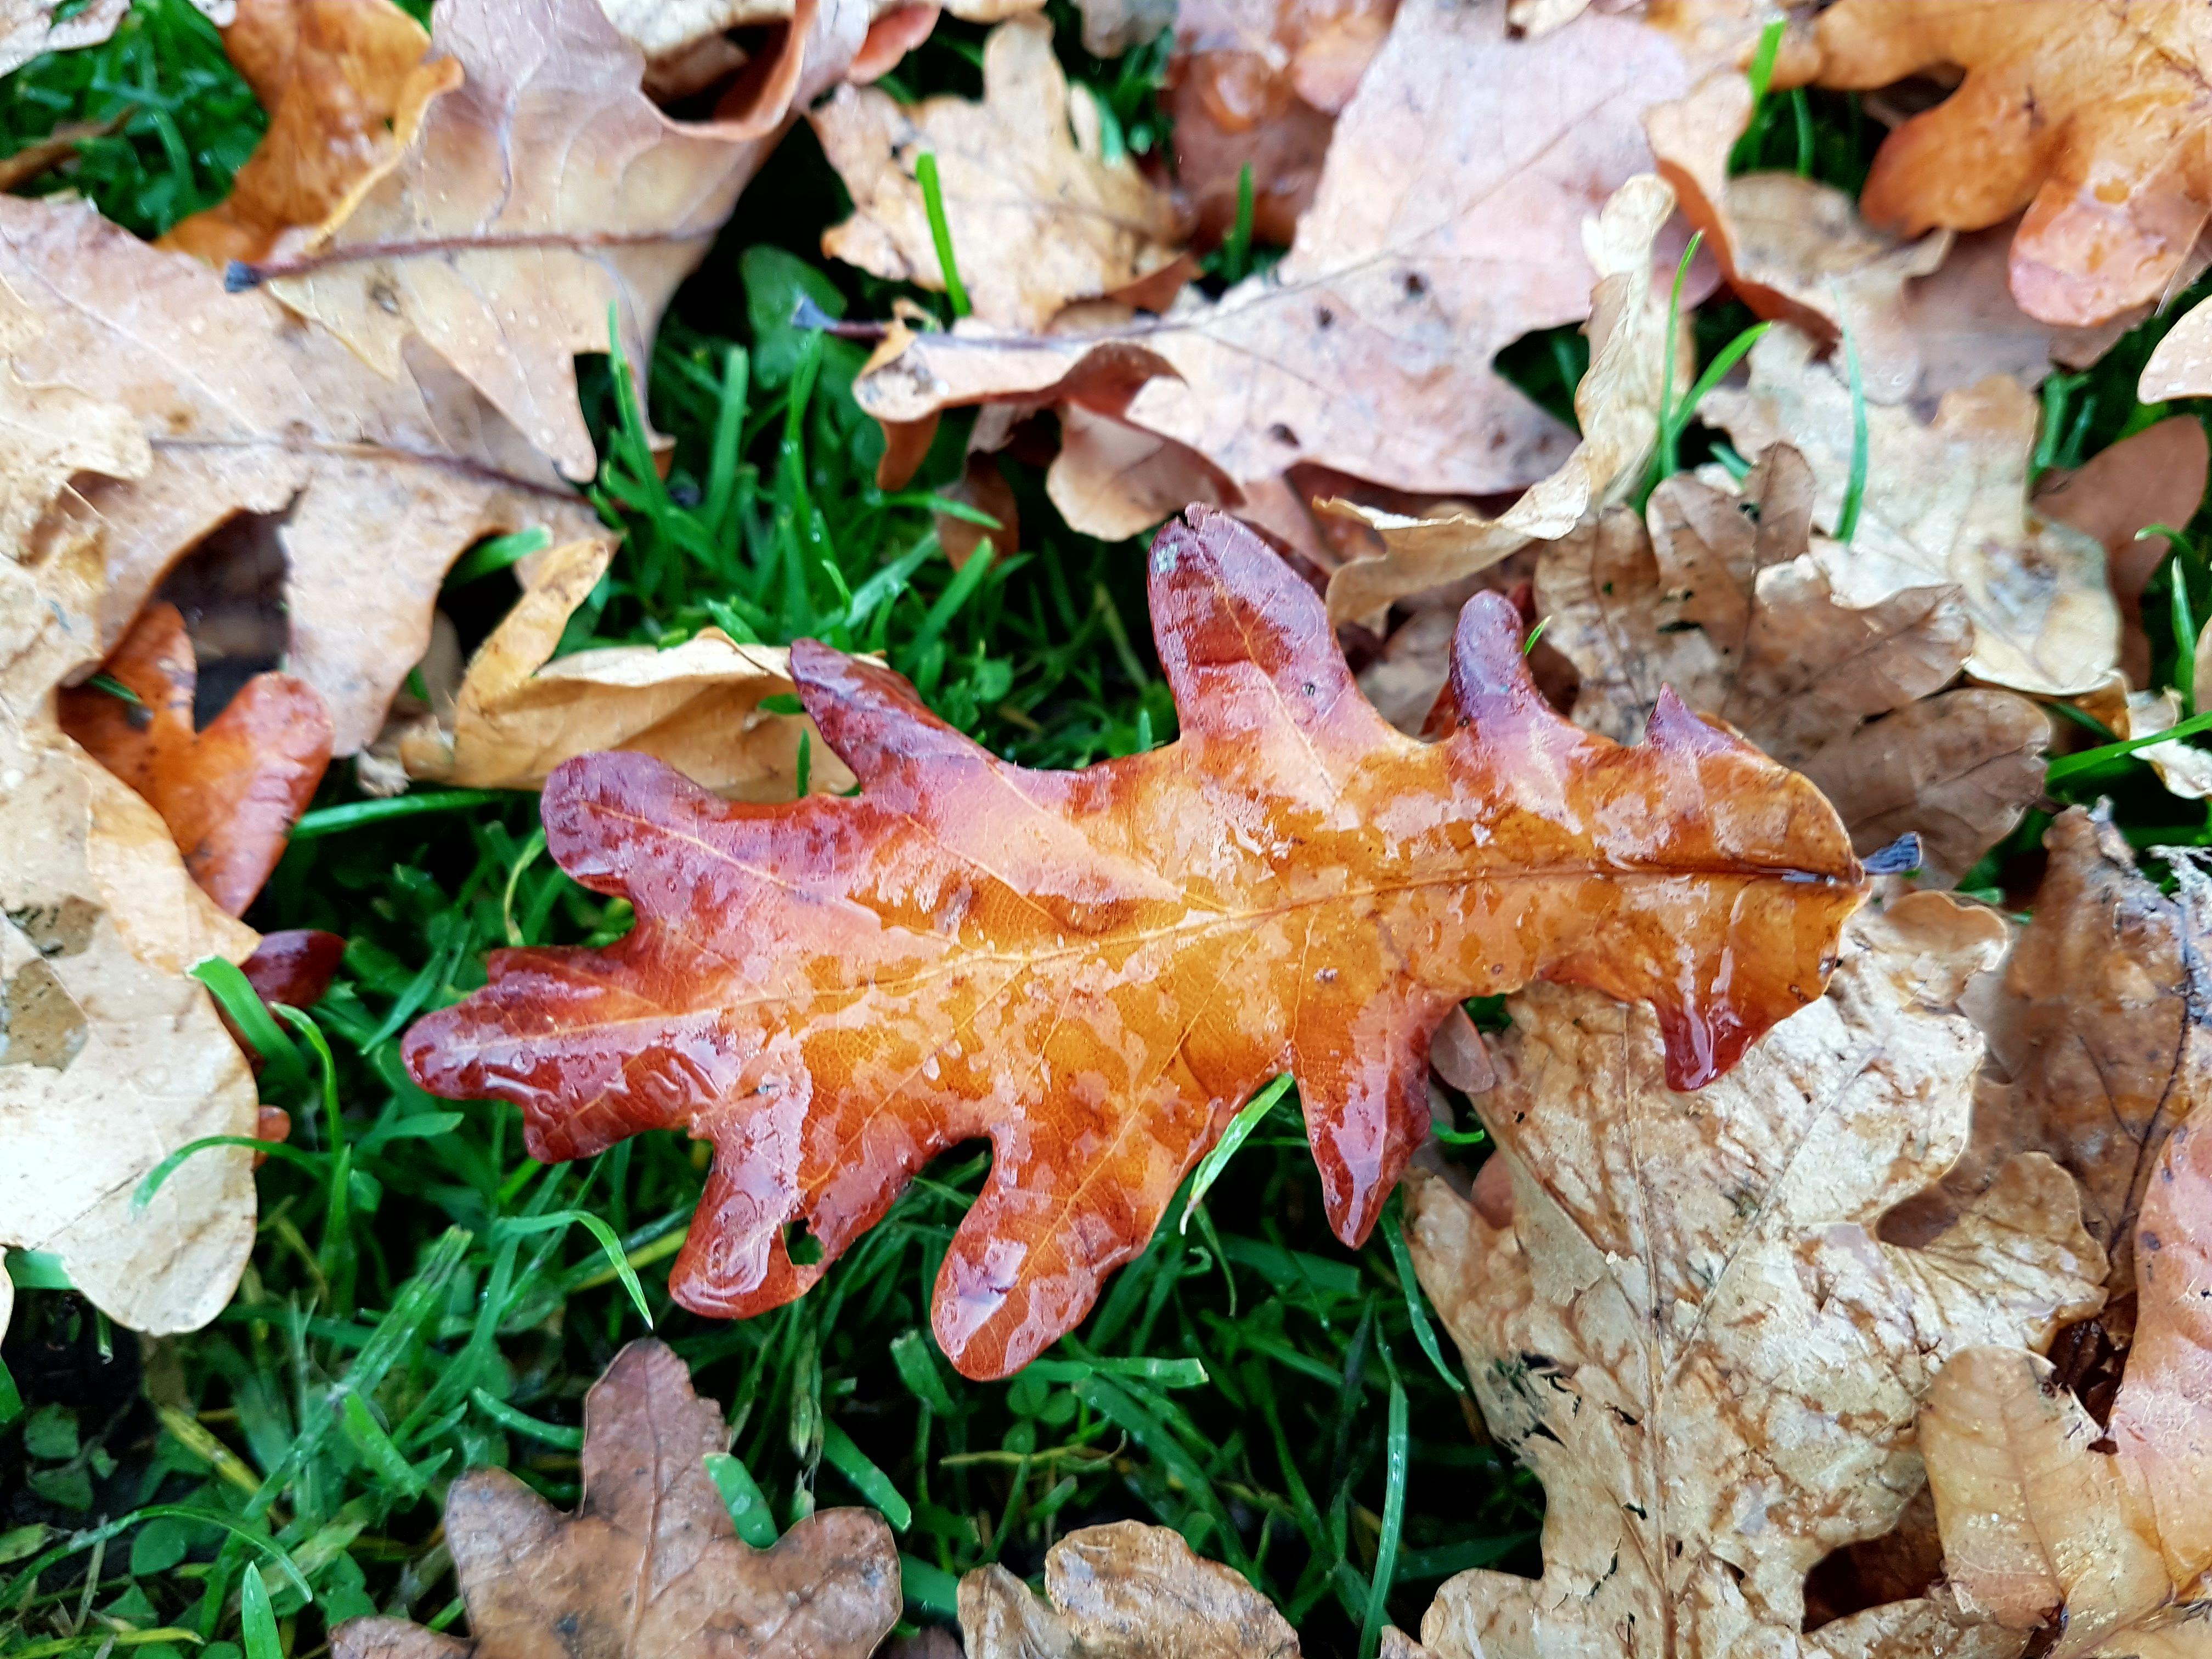 Wet autumn leaf in the rain